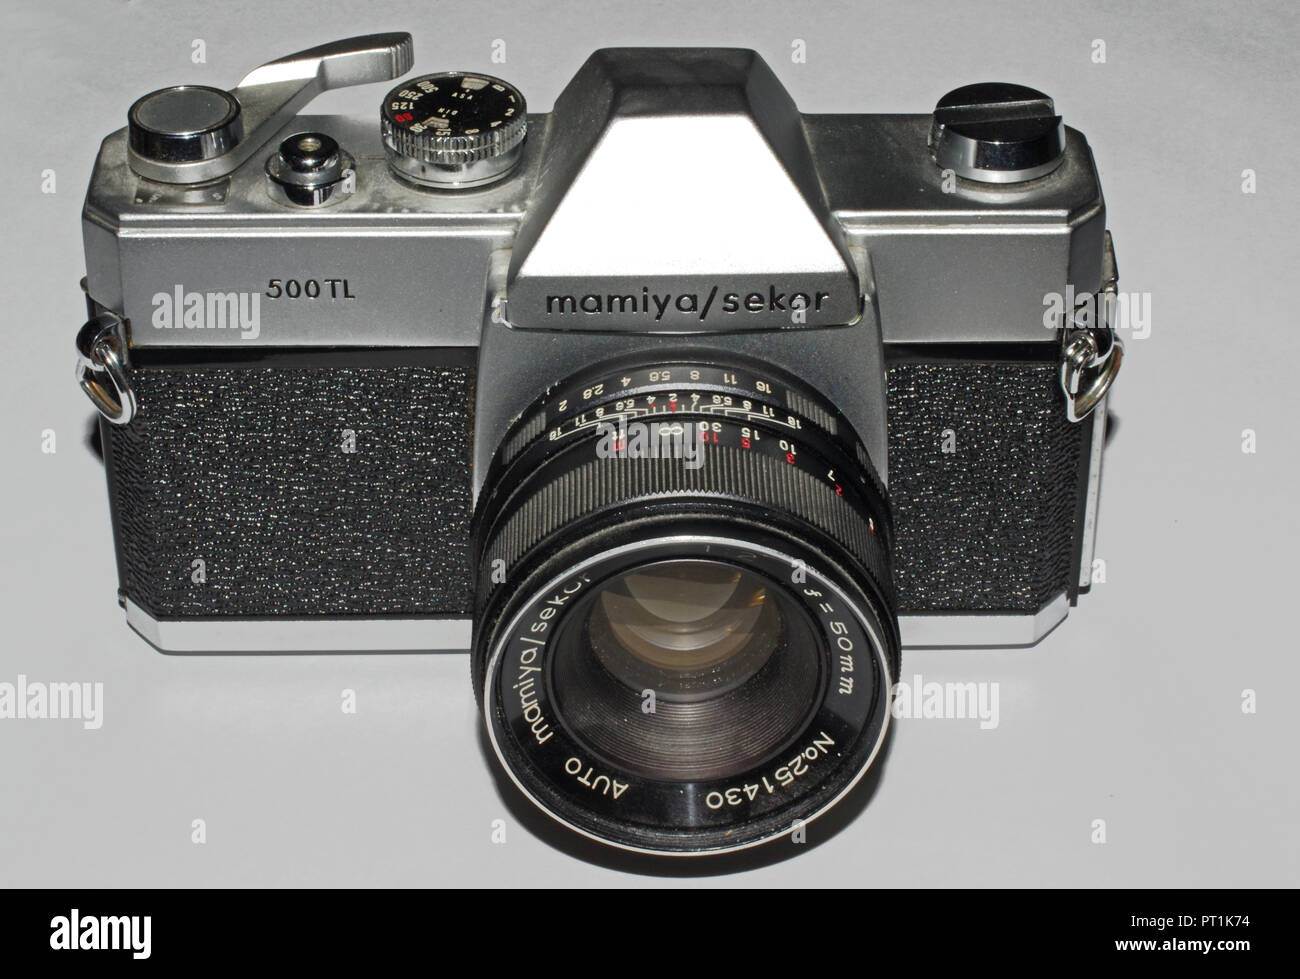 Mamiya Sekor 500 TL camera  with lens (1965 about) - Stock Image